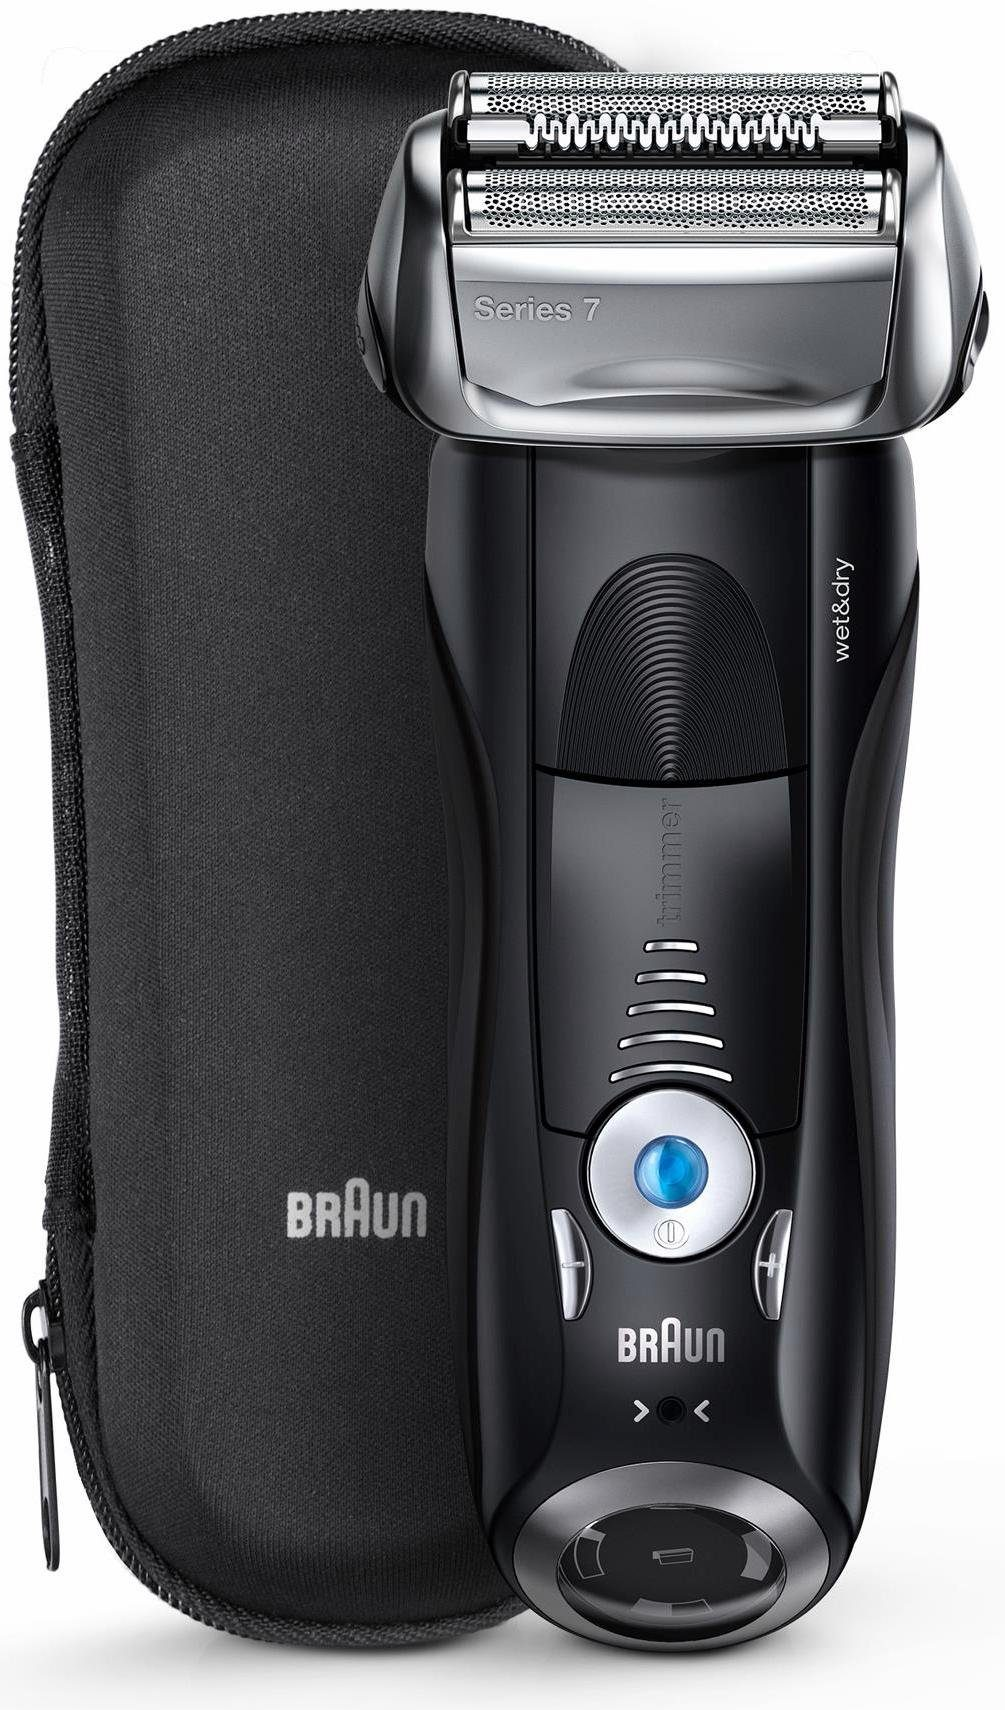 Braun Elektrorasierer Series 7 7840s, Wet&Dry mit Reise- Etui